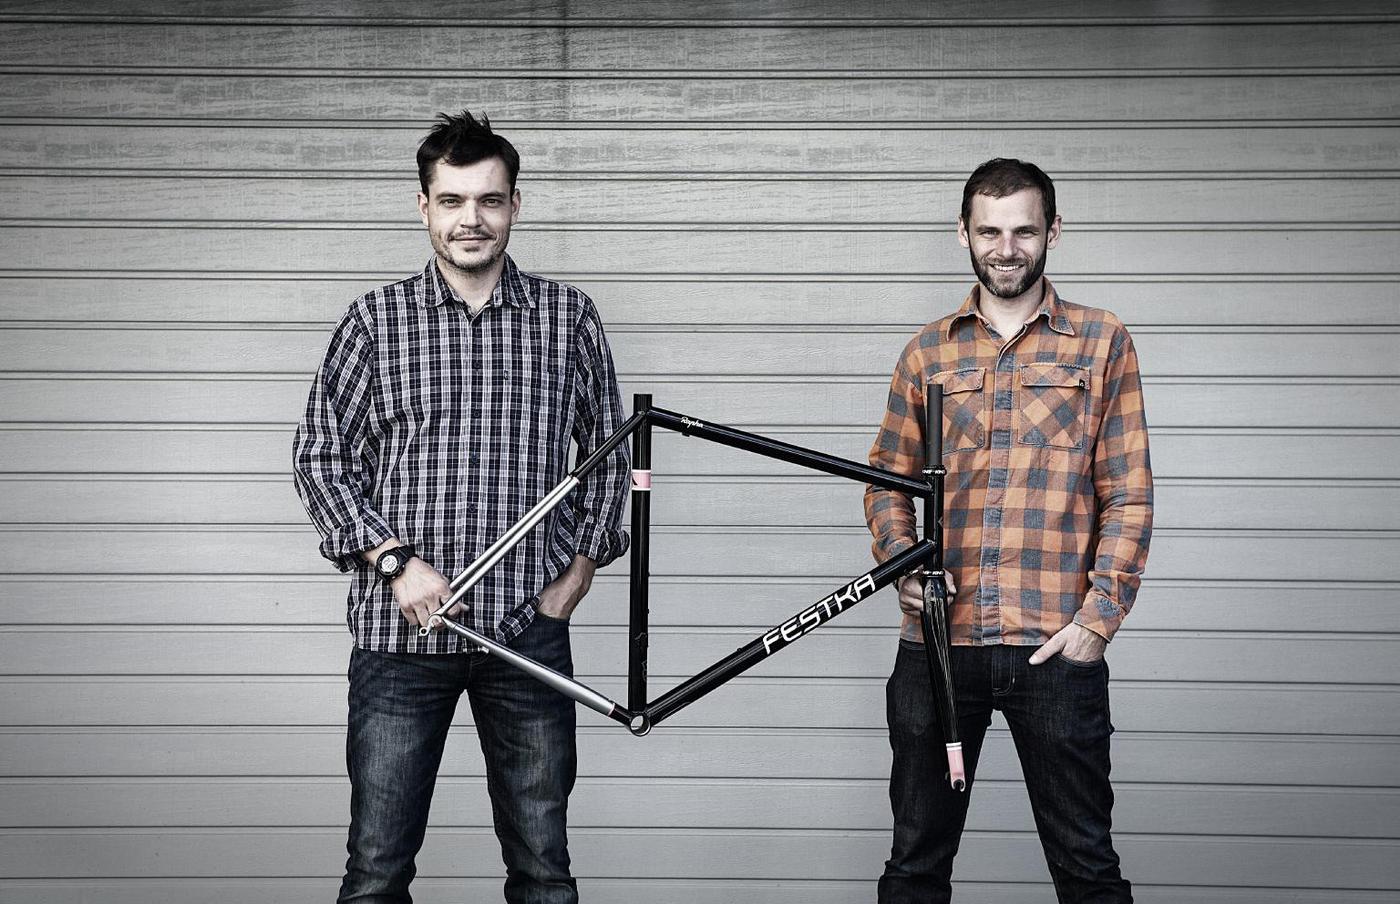 Festka Announces Their Most Popular Bikes of 2020